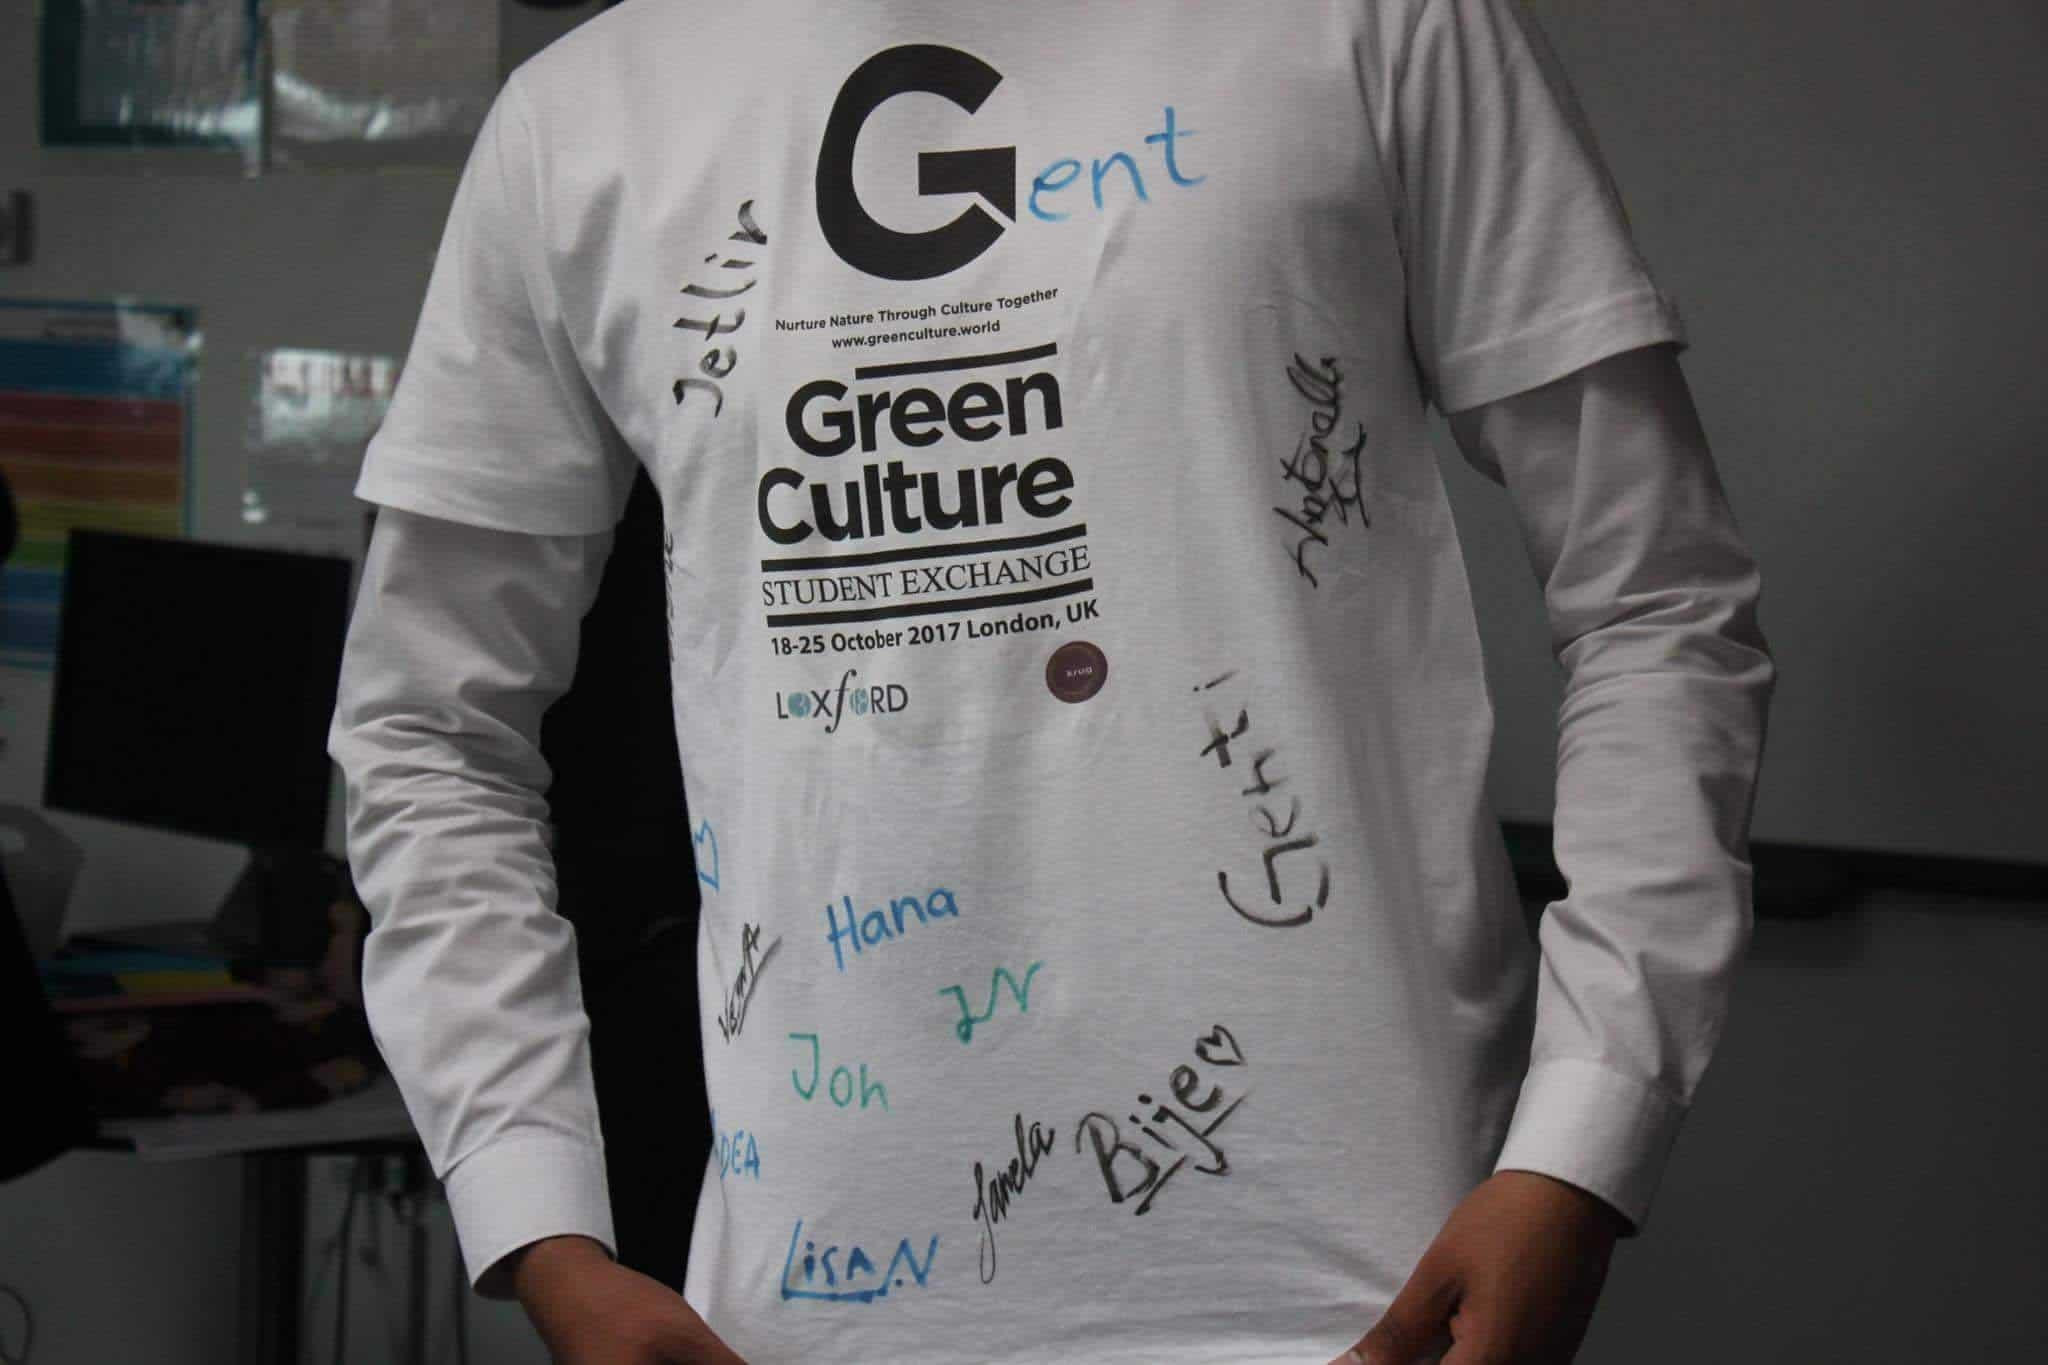 studentexchange_greenculture_7